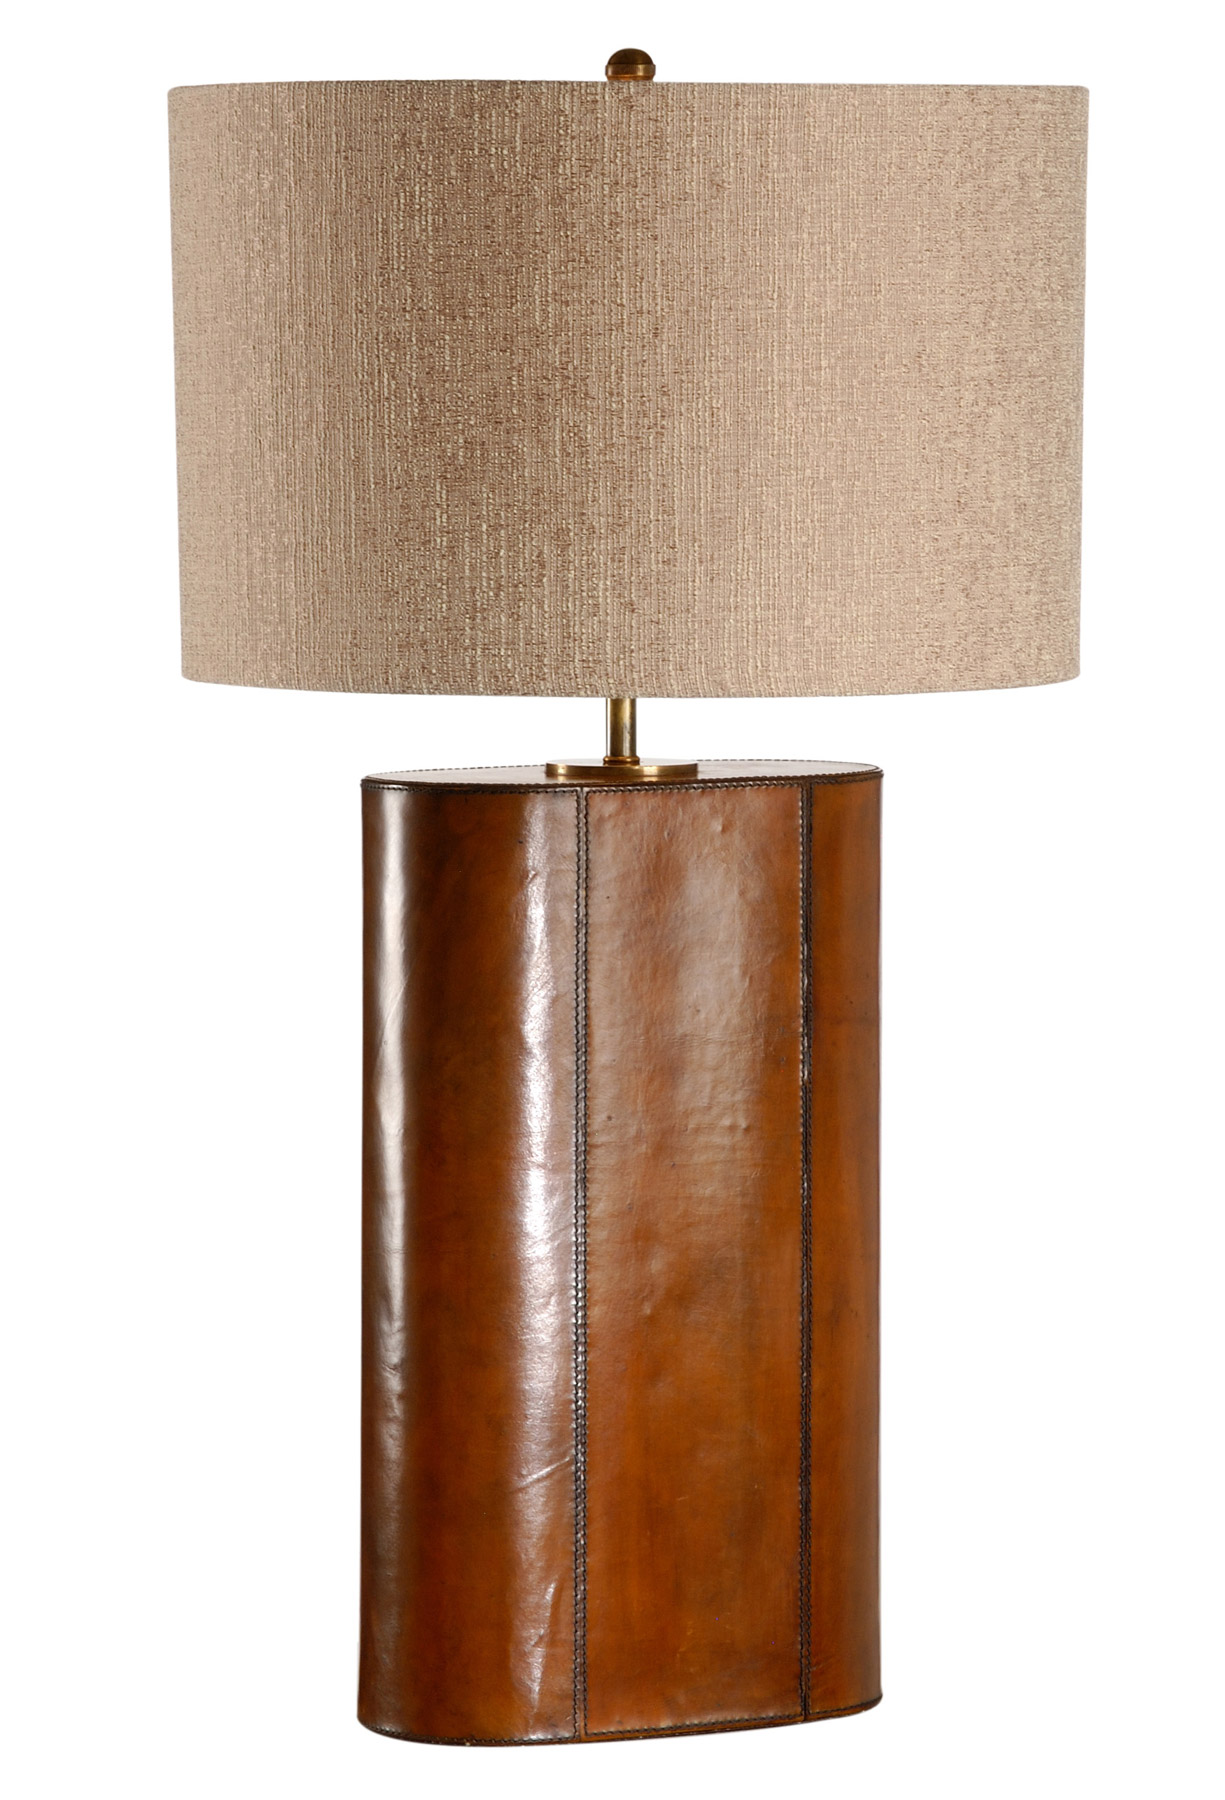 cooper lamps photo - 8